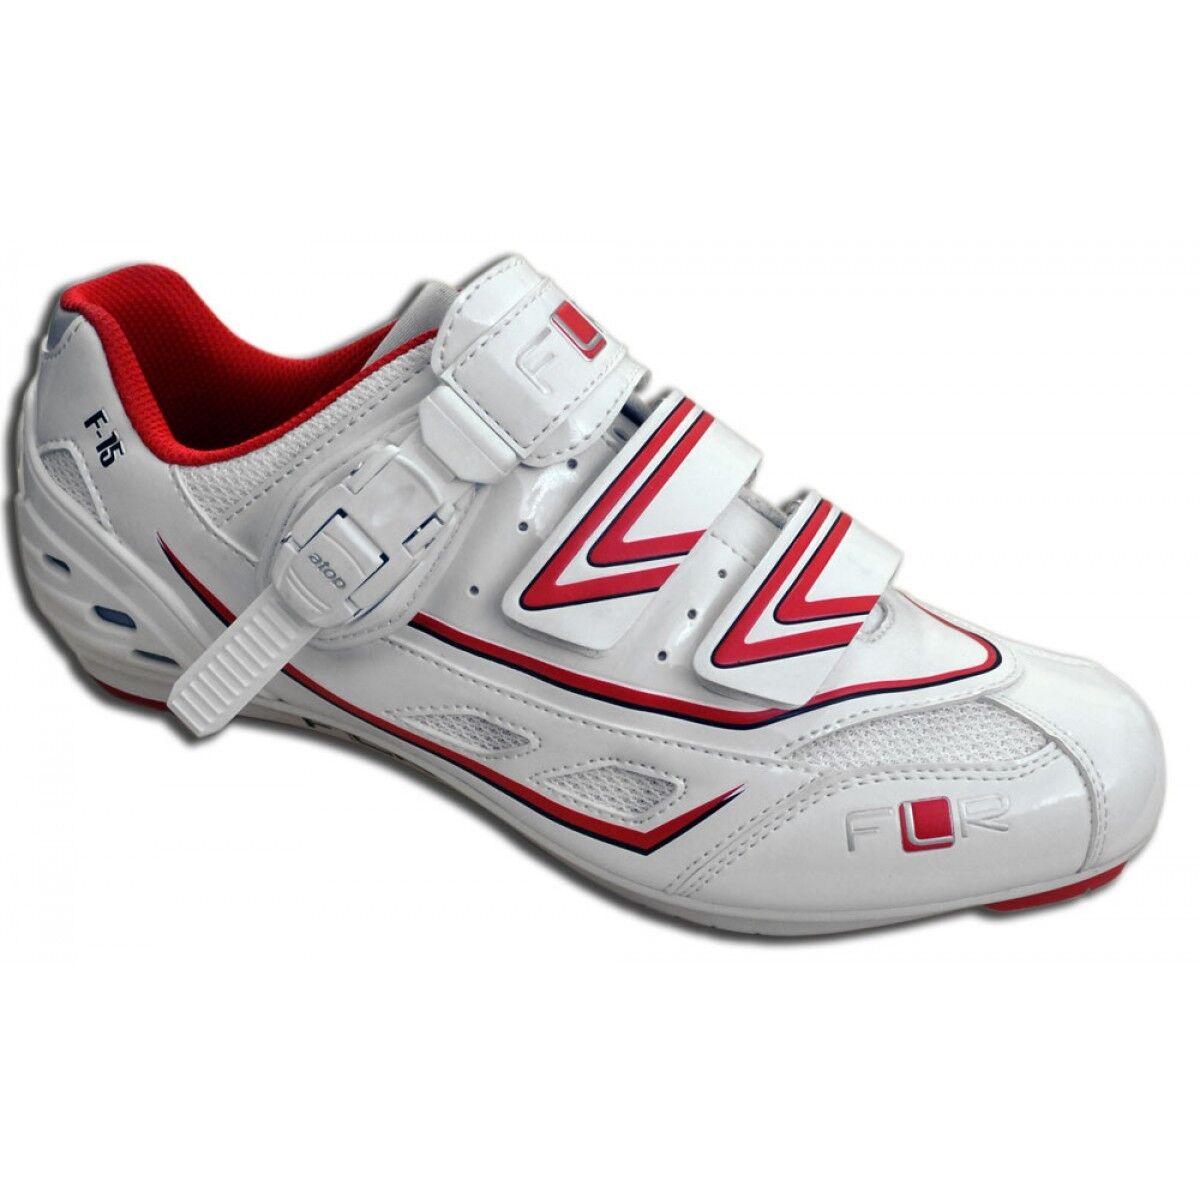 FLR F-15 road cycling shoes